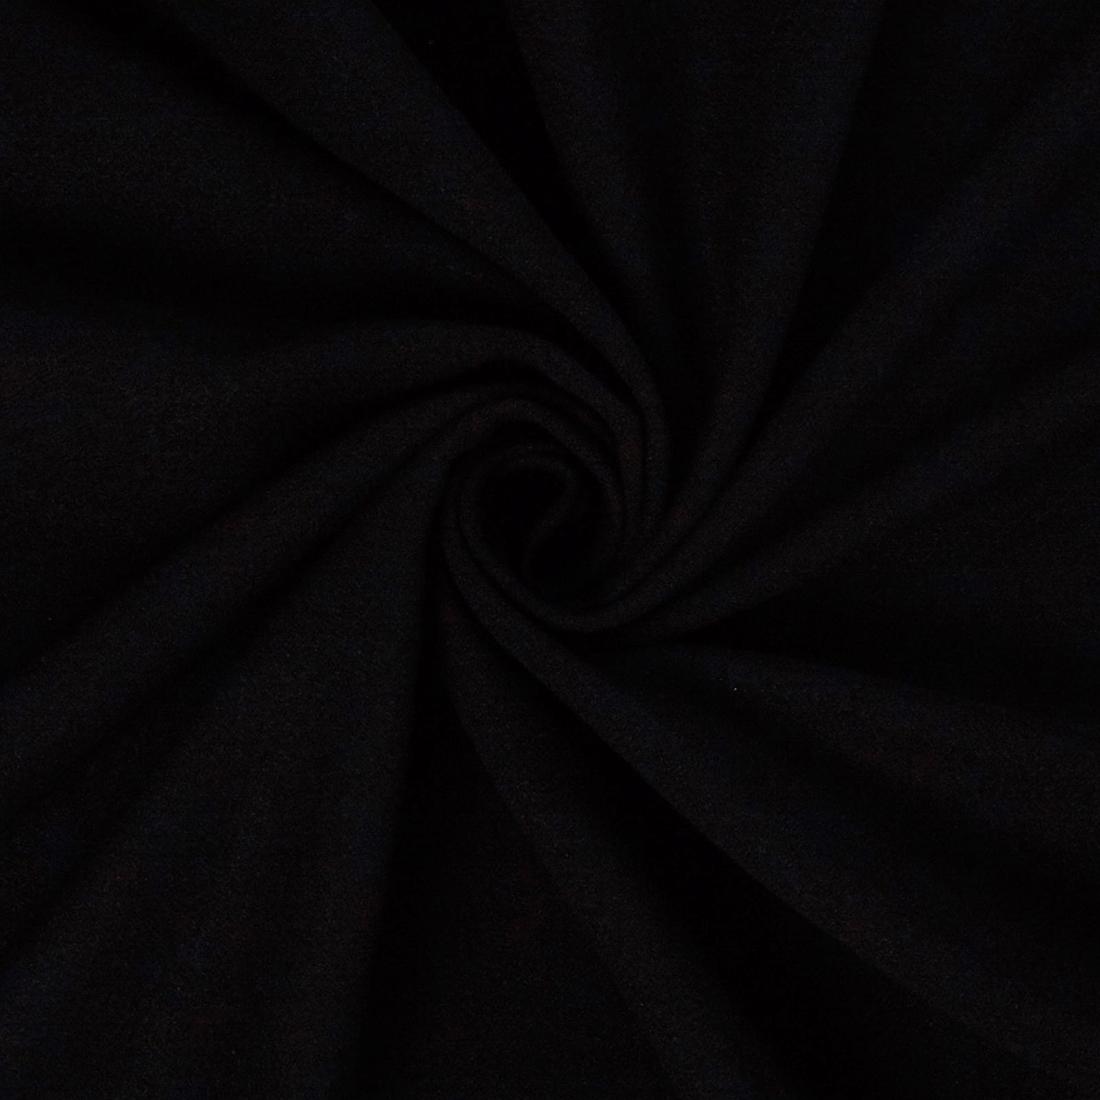 Moss Crepe Black Dress Fabric